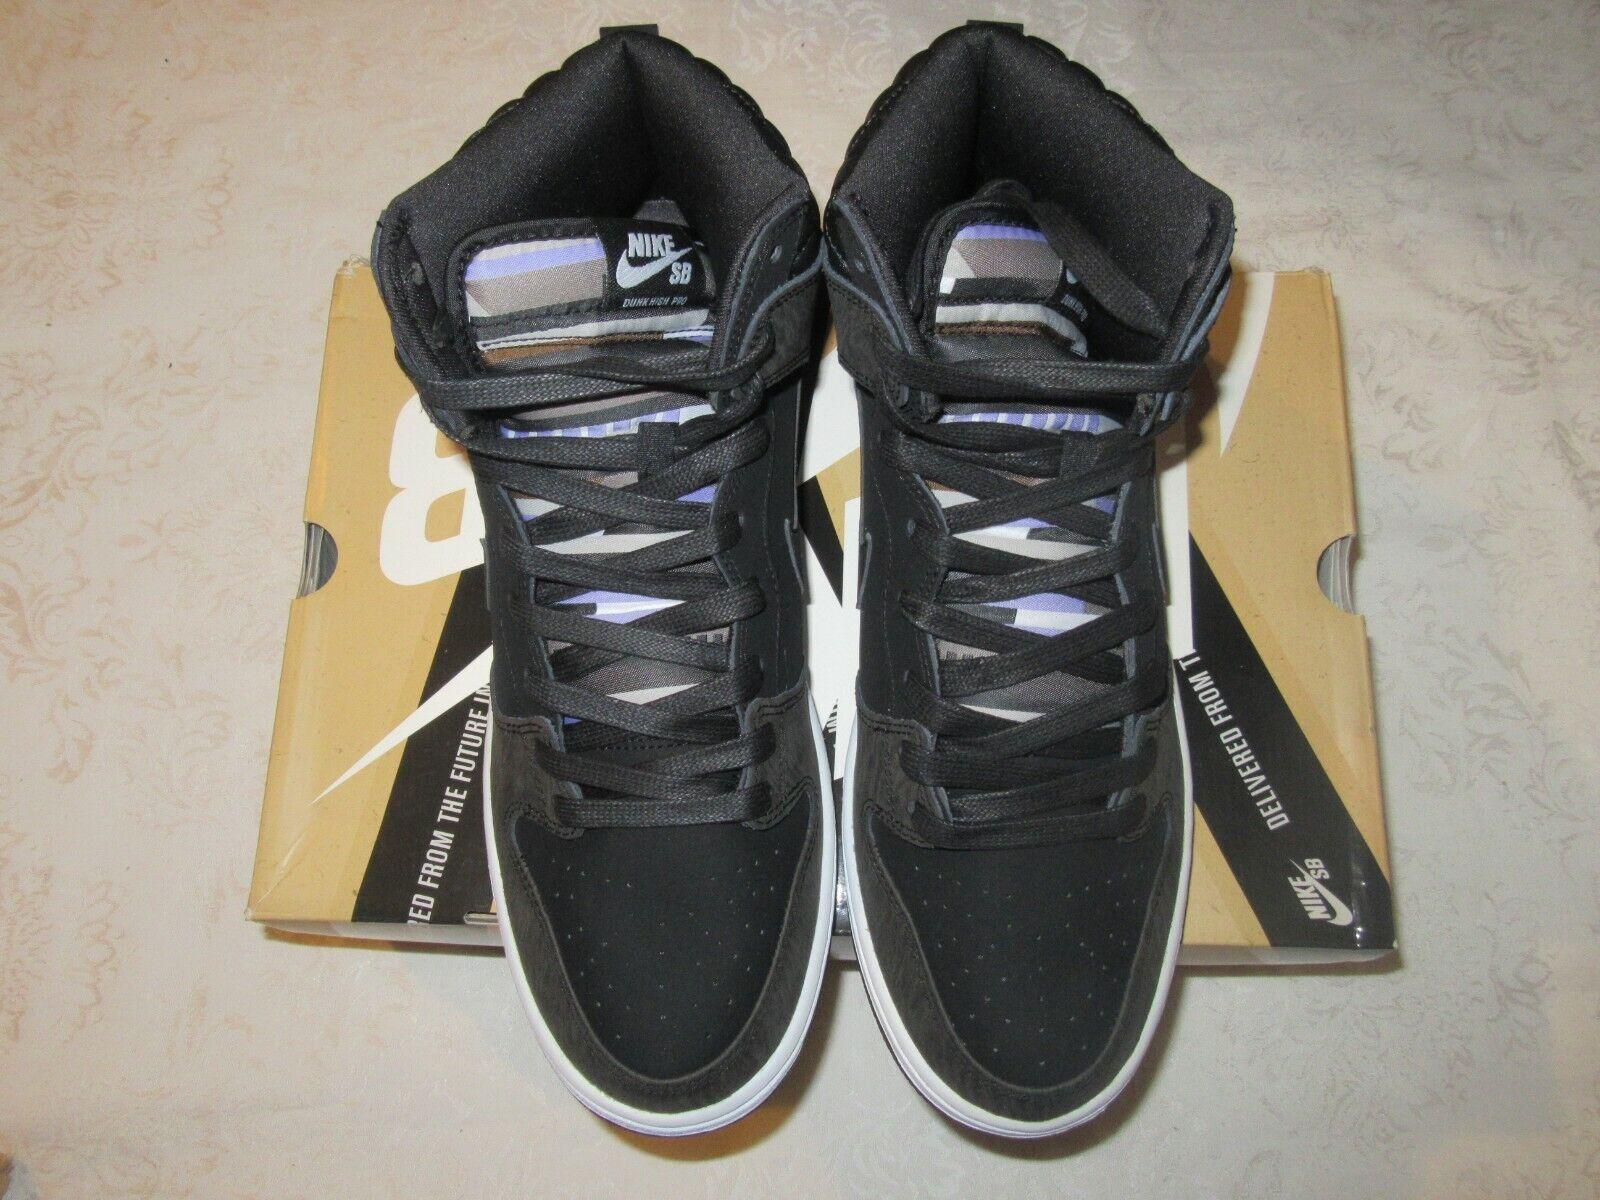 Nike SB Dunk High Premium Civilist 313171 016 US Size 11 Sneakers